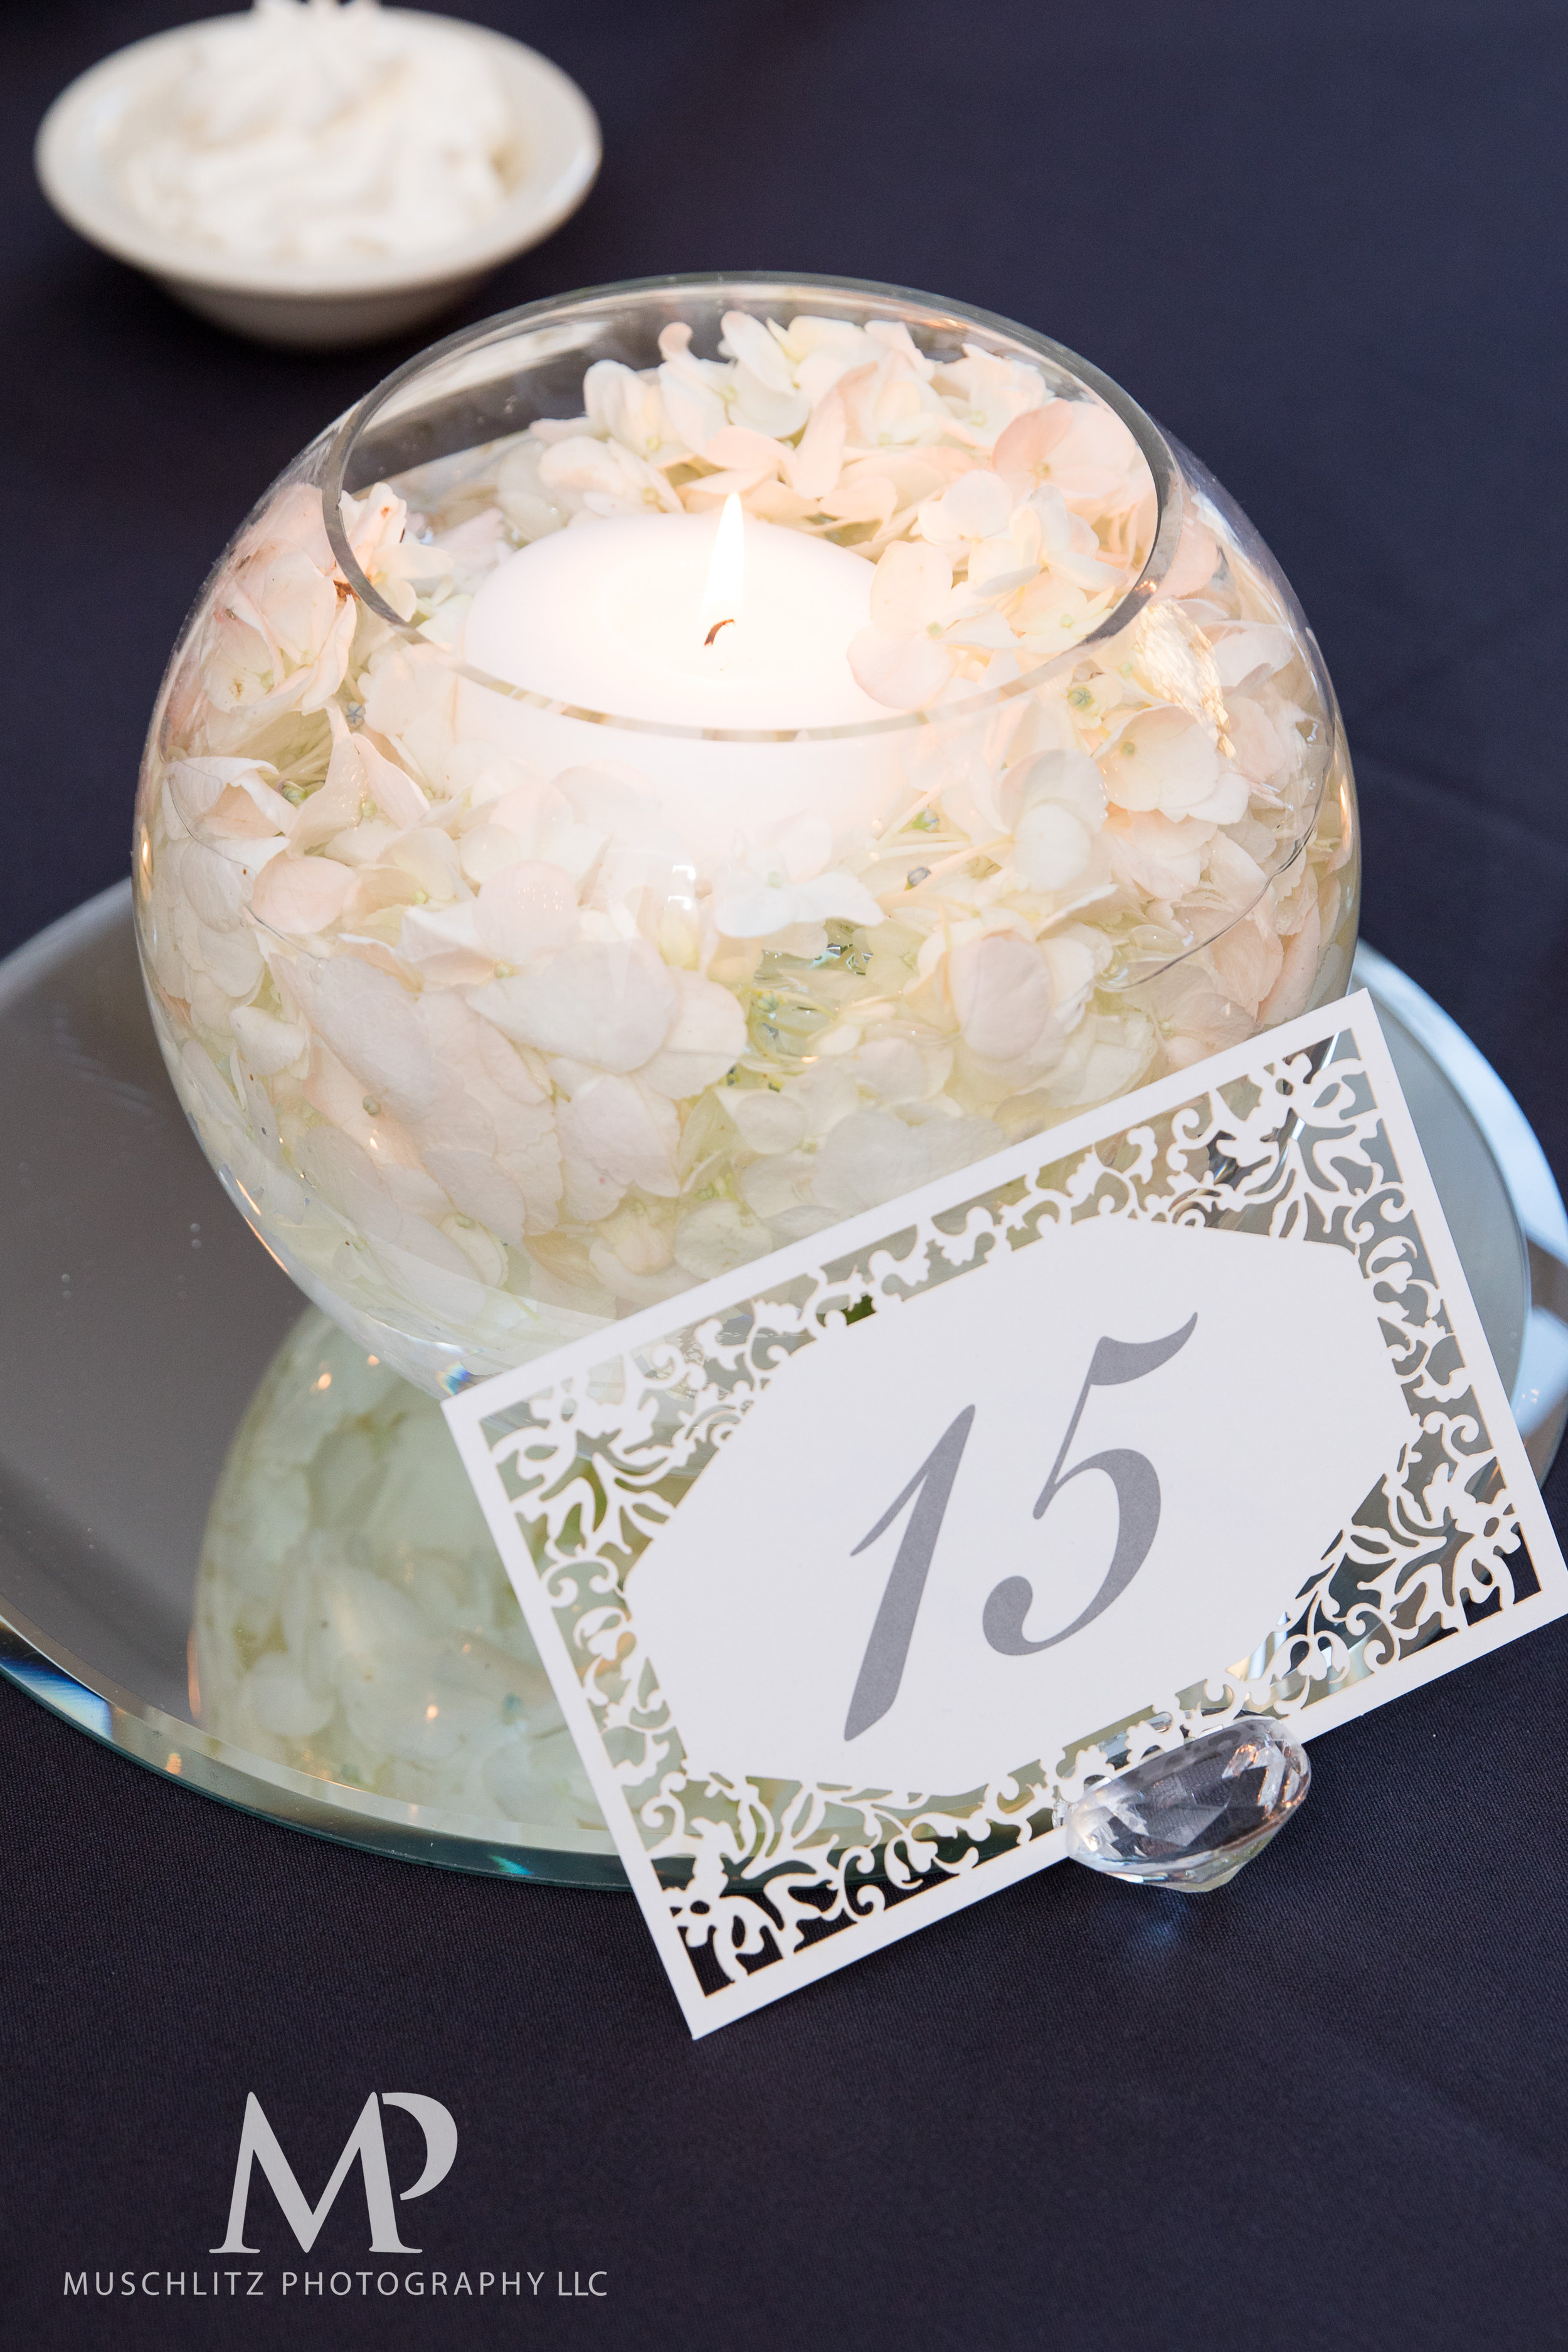 annunciation-banquet-conference-center-downtown-columbus-wedding-reception-downtown-columbus-ohio-muschlitz-photography-007.JPG